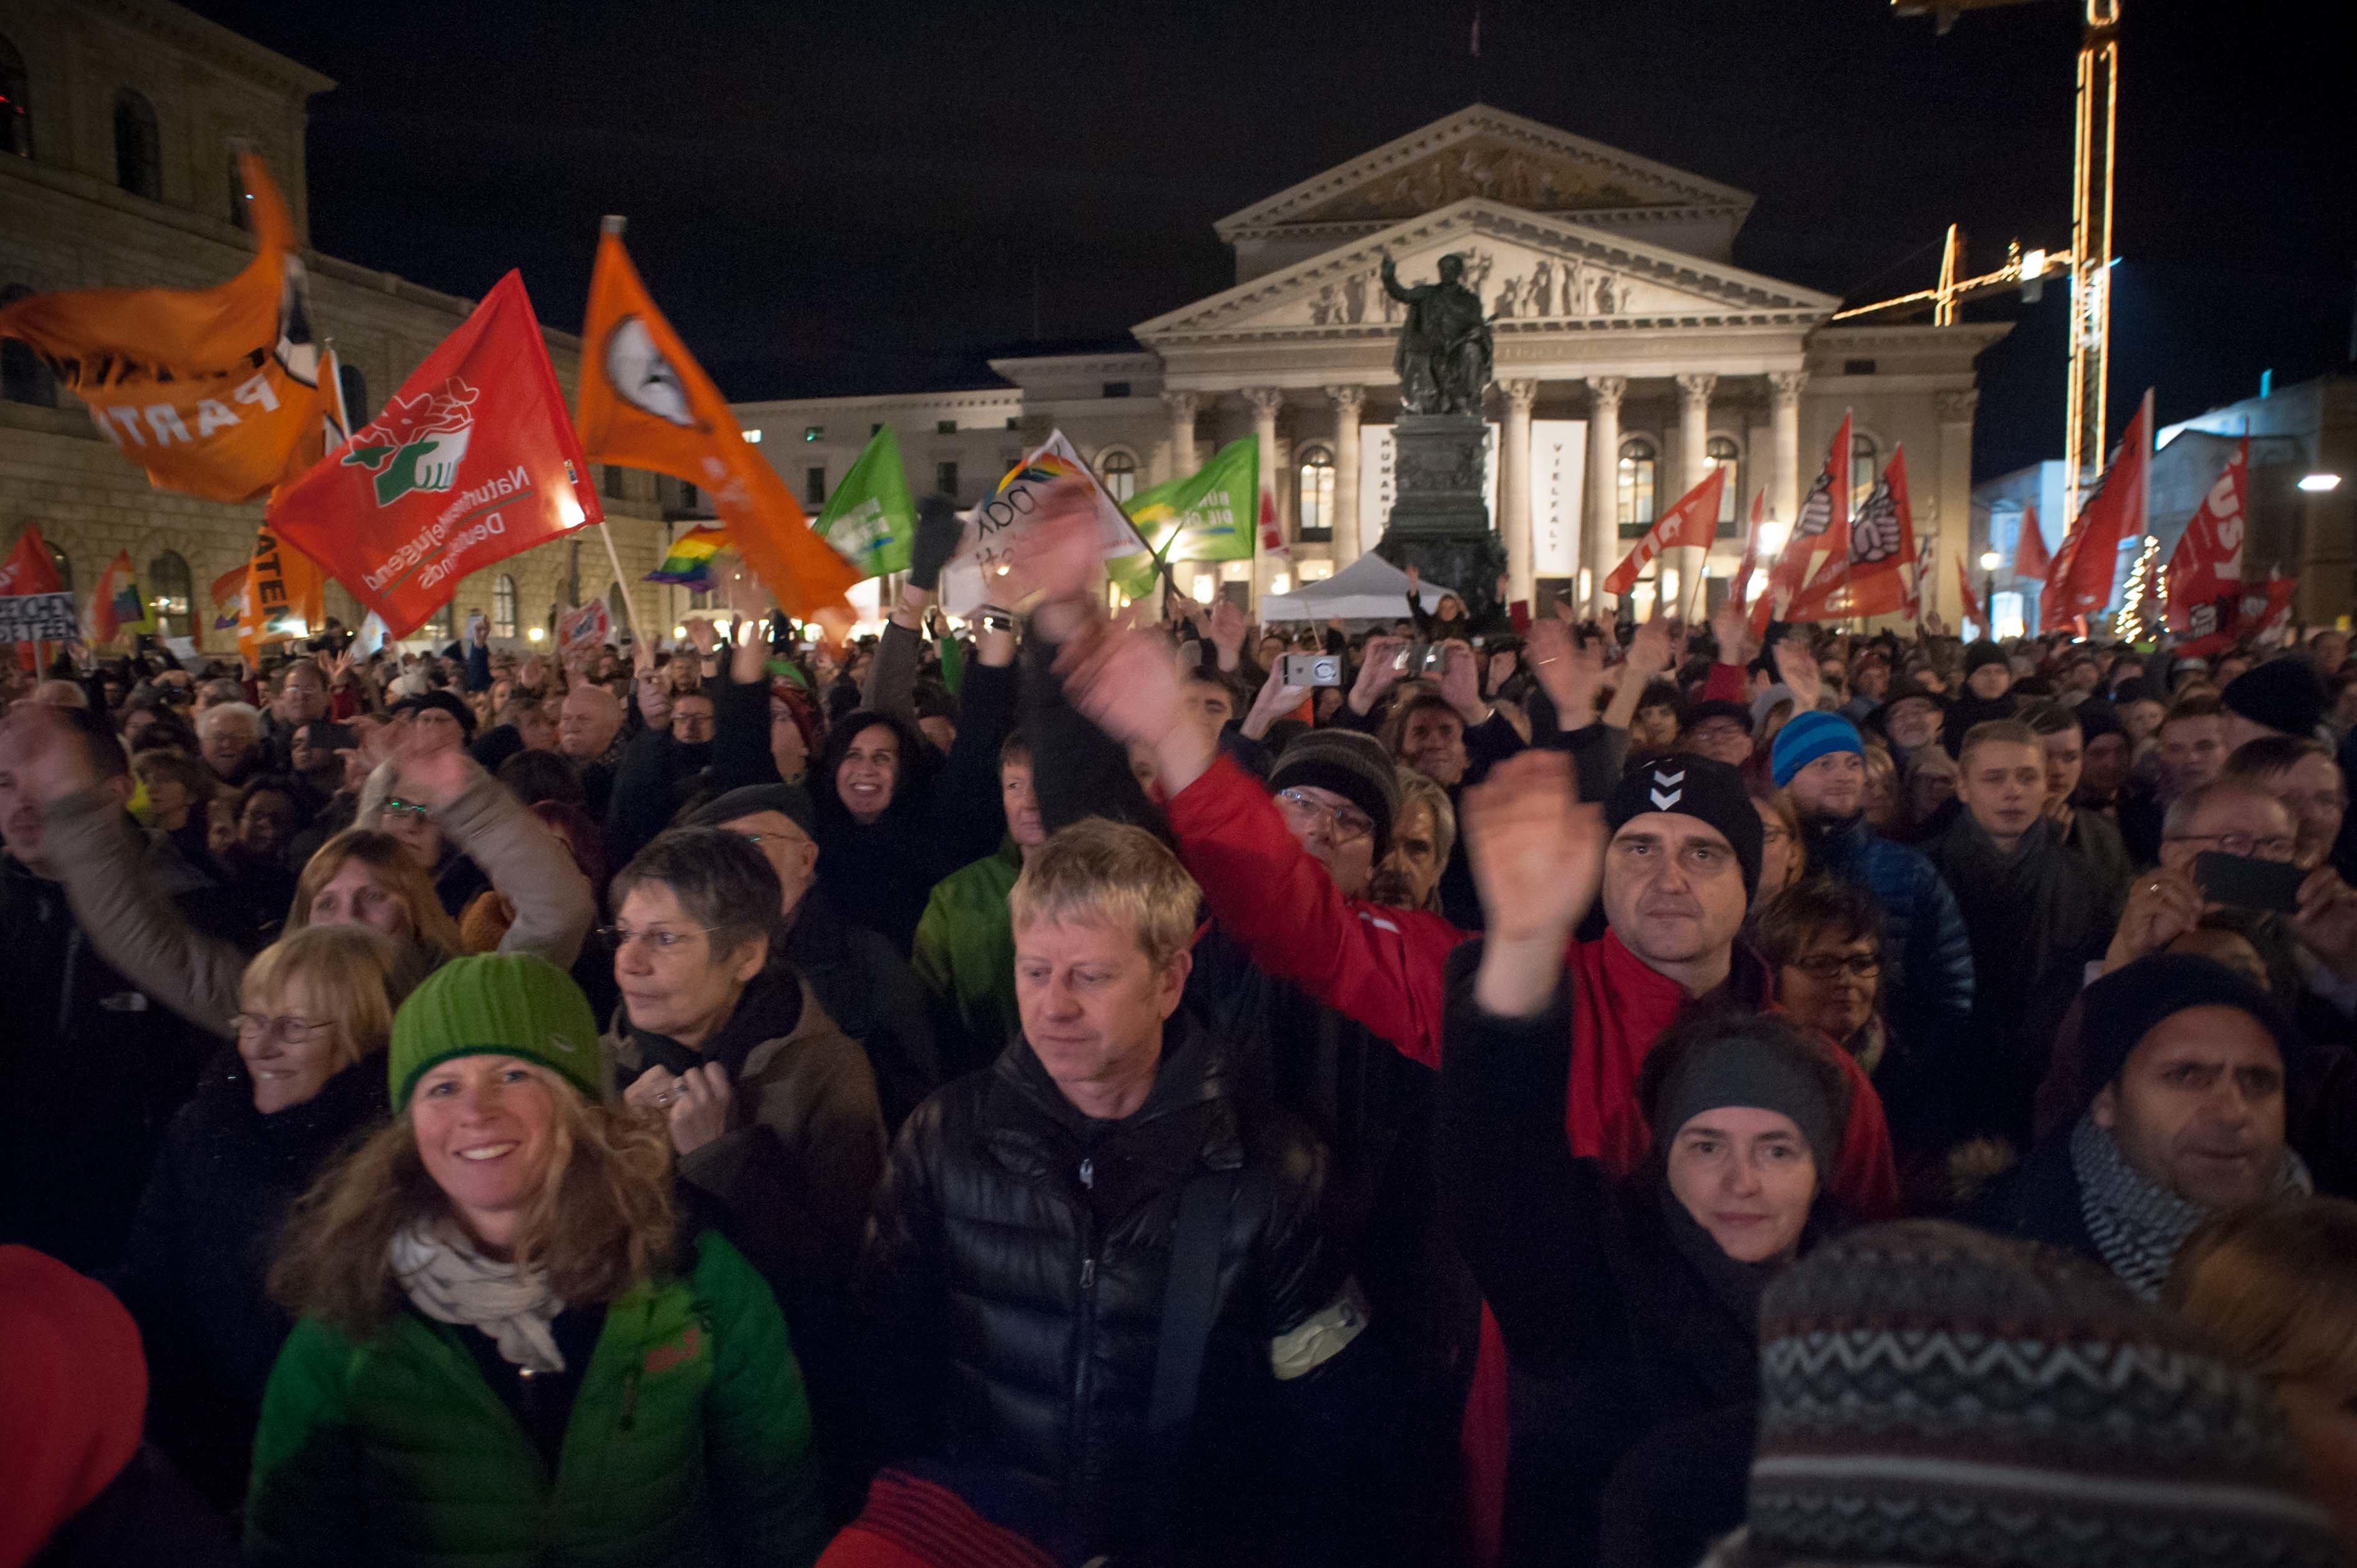 Anti_Rechts_Demo_22.12.2014-16